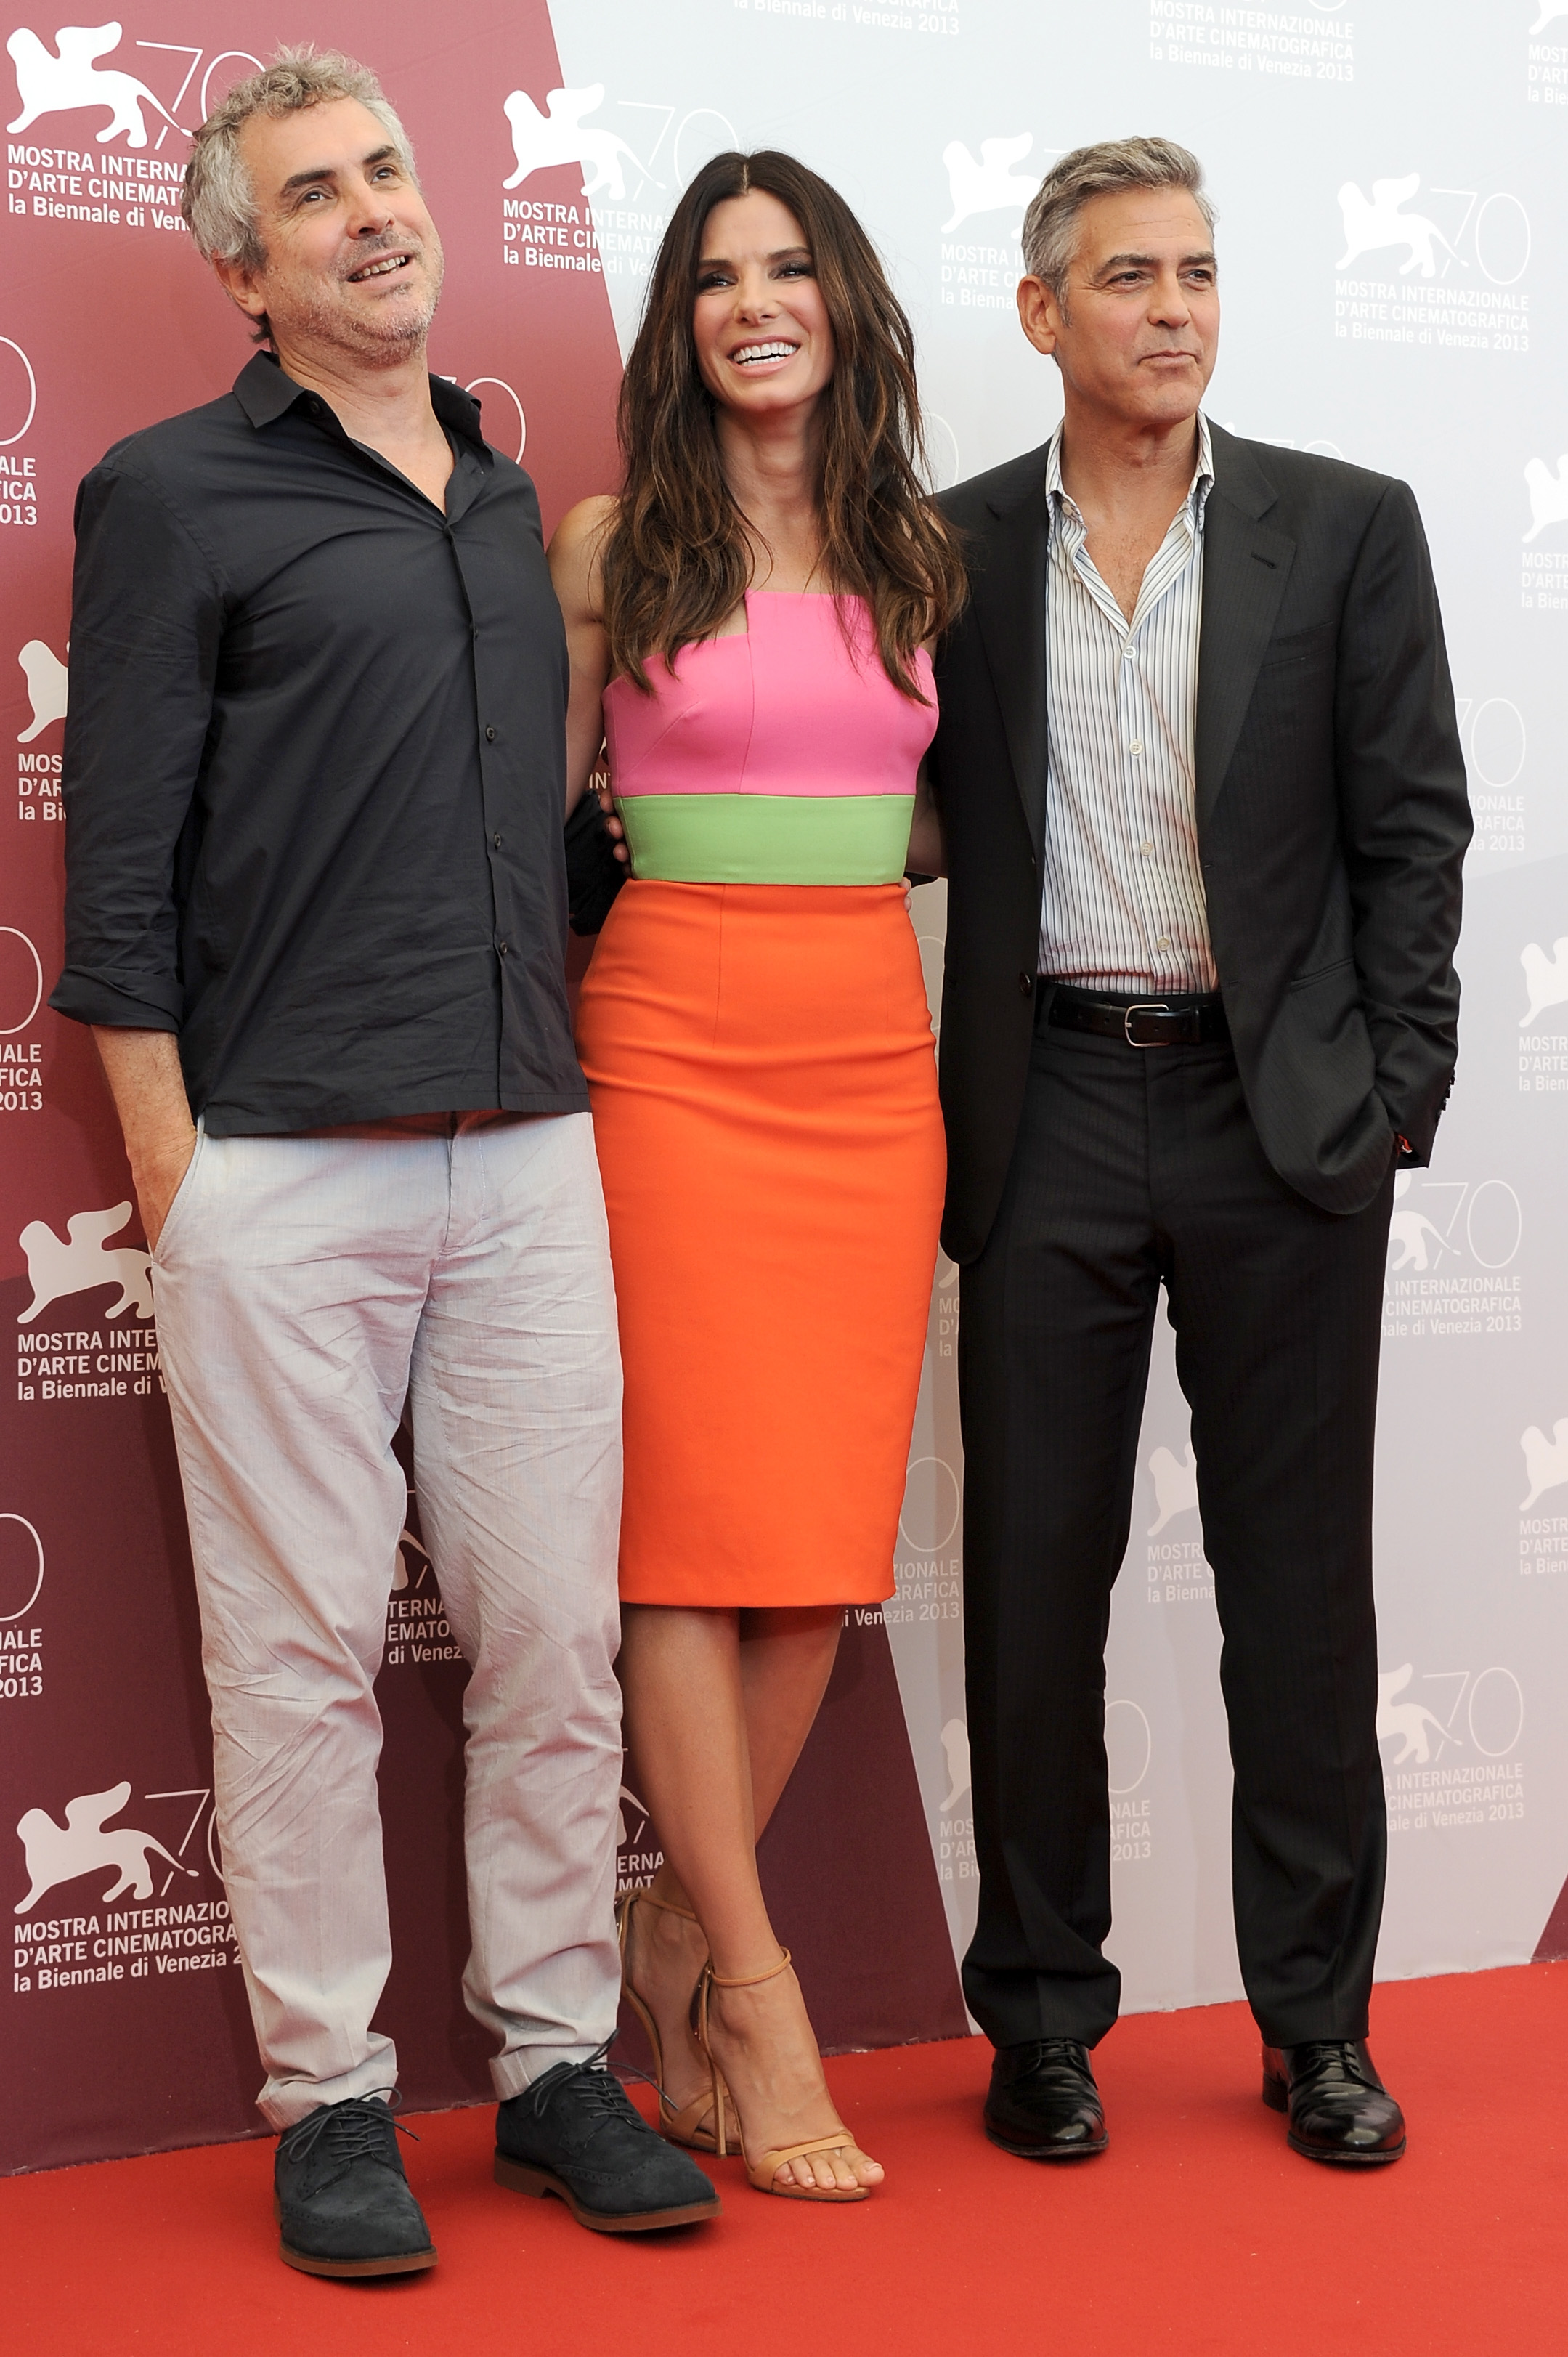 lfonso Cuaron, actress Sandra Bullock and actor George Clooney